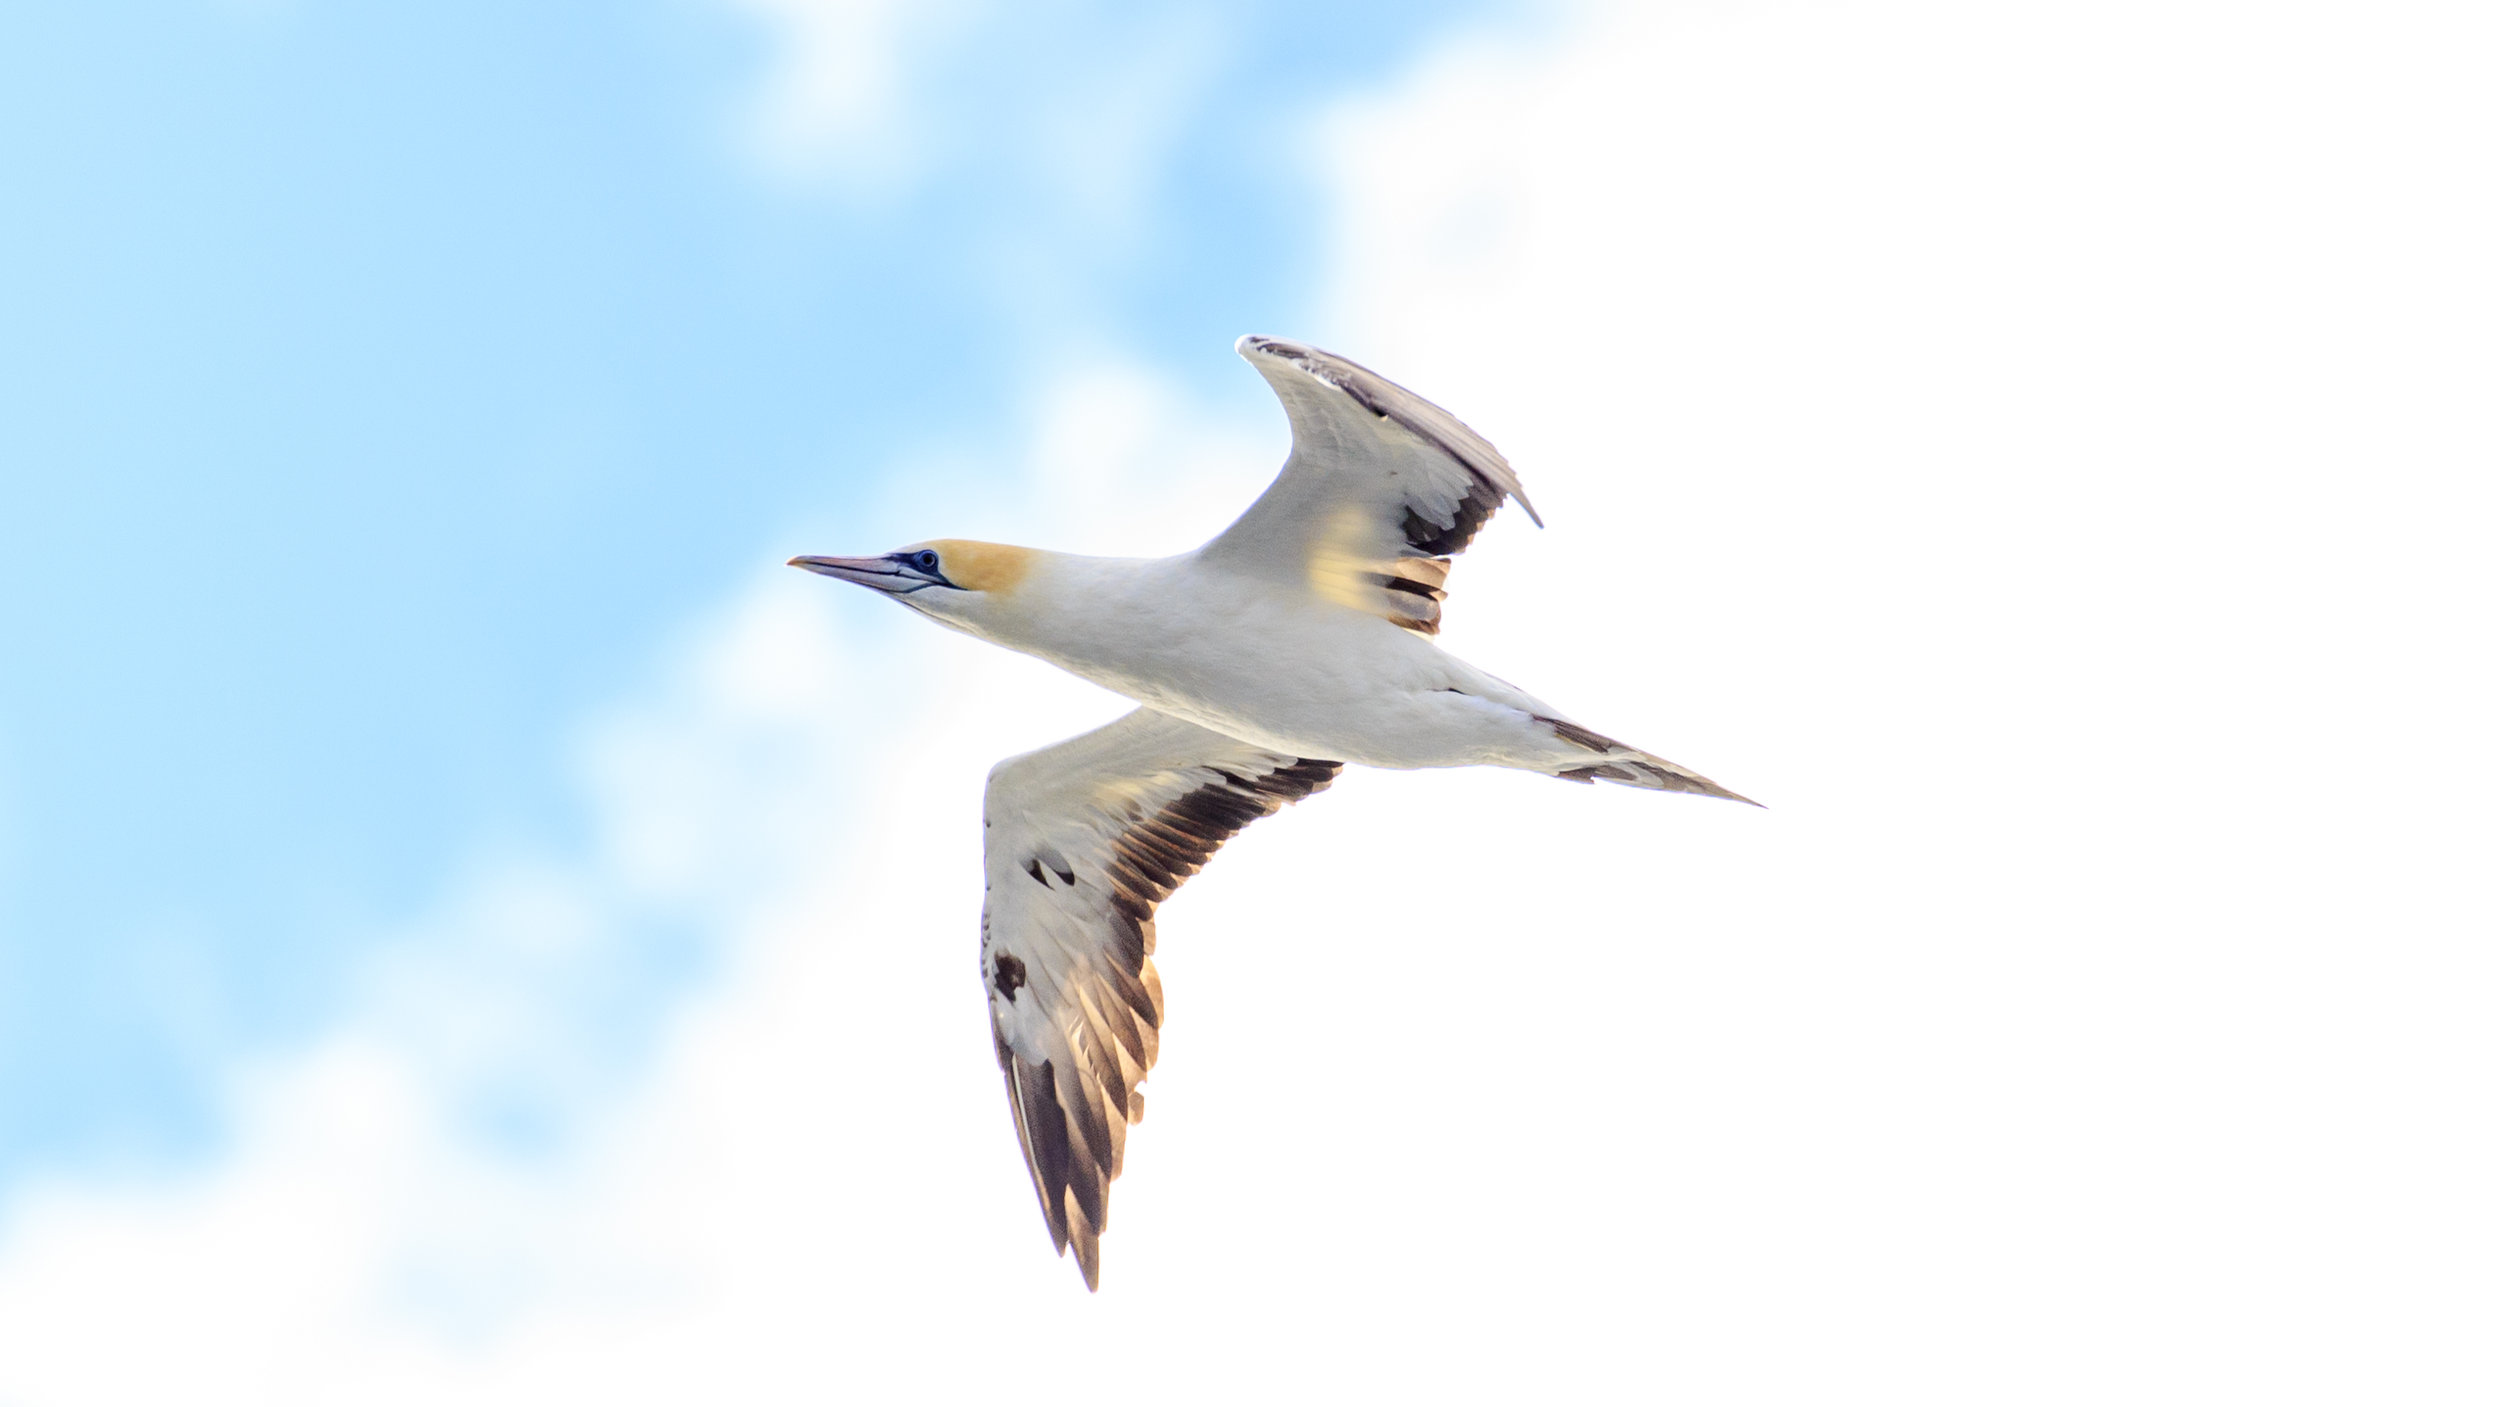 Australasian Gannet - Just one of the local bird species